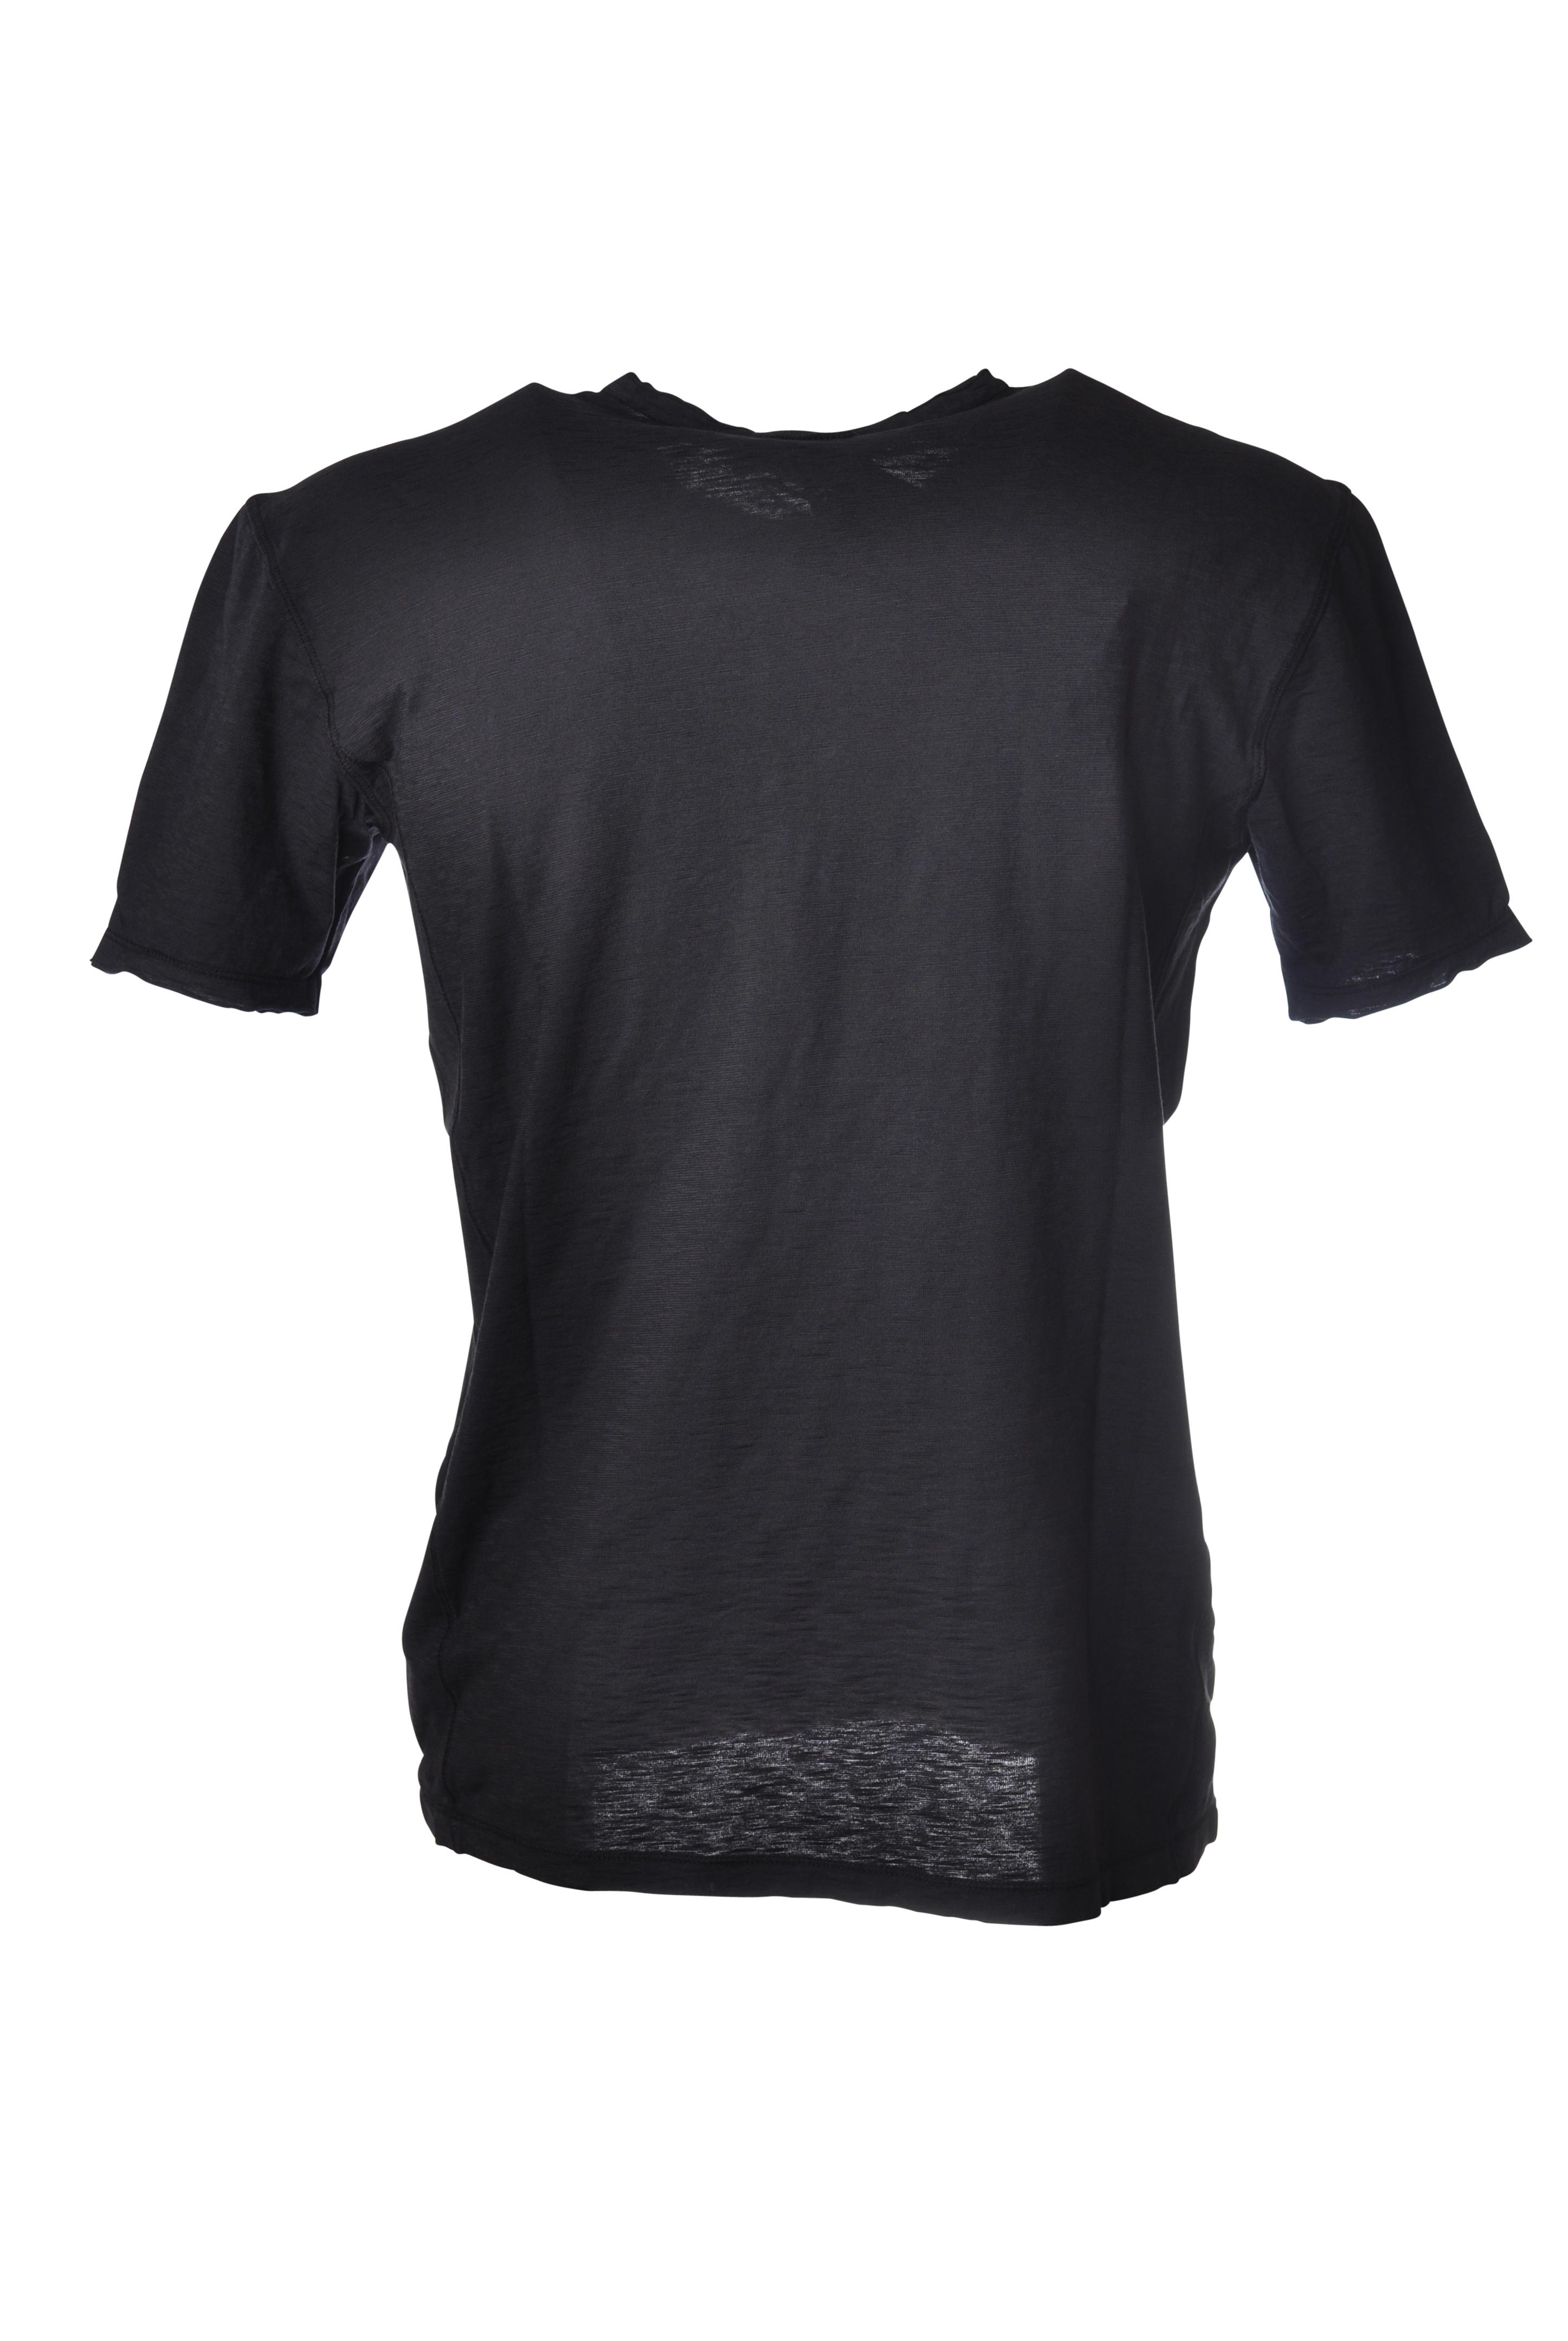 Hosio - - - Topwear-T-shirts - Mann - Blau - 5275910H182136   Schön und charmant  017757